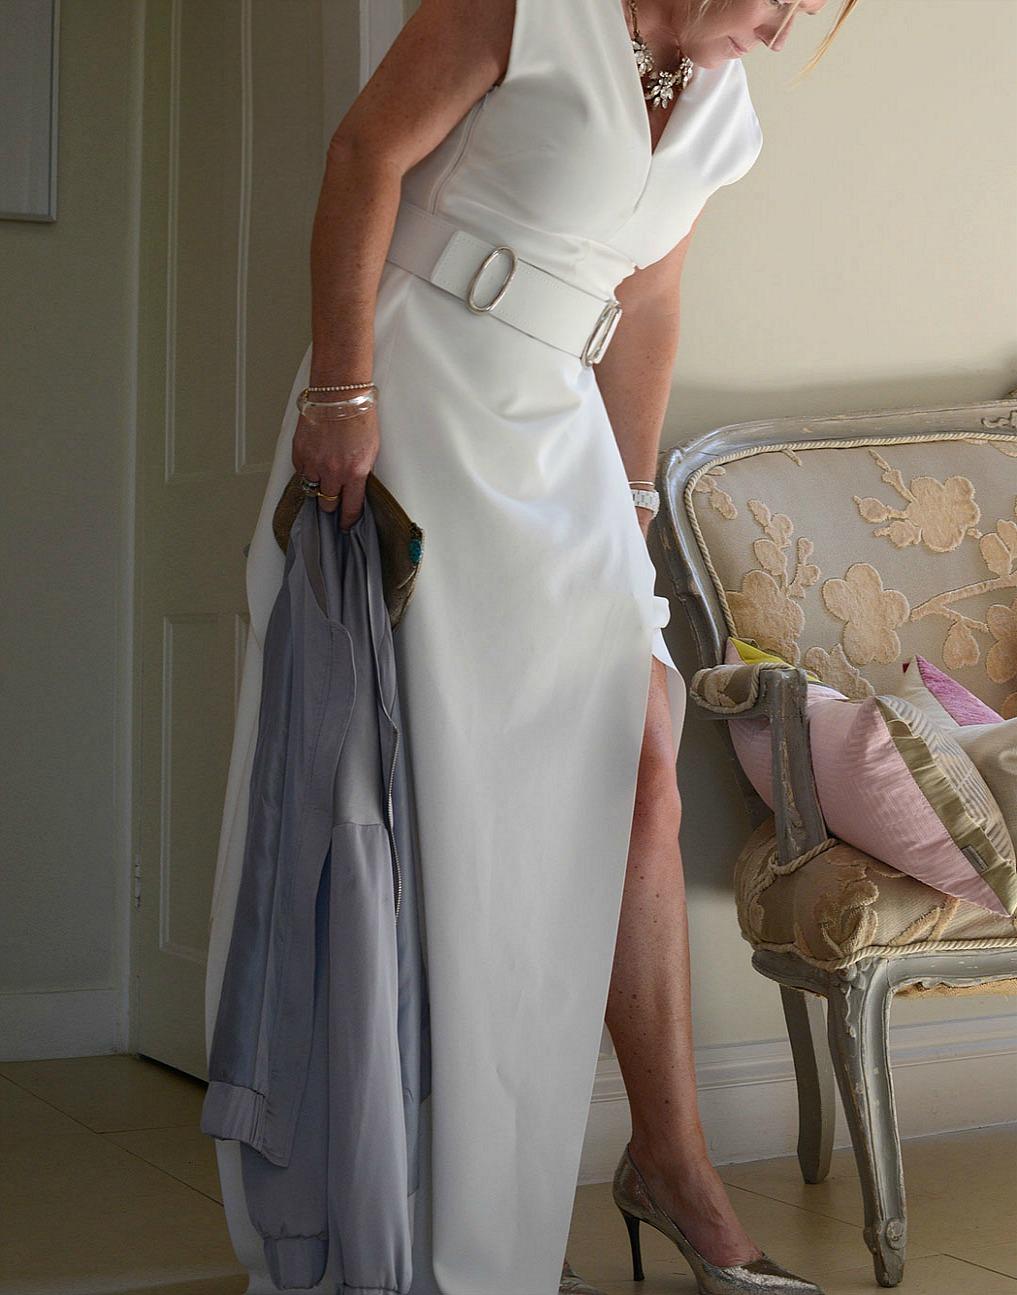 sara delaney wearing a maxmara summer event dress